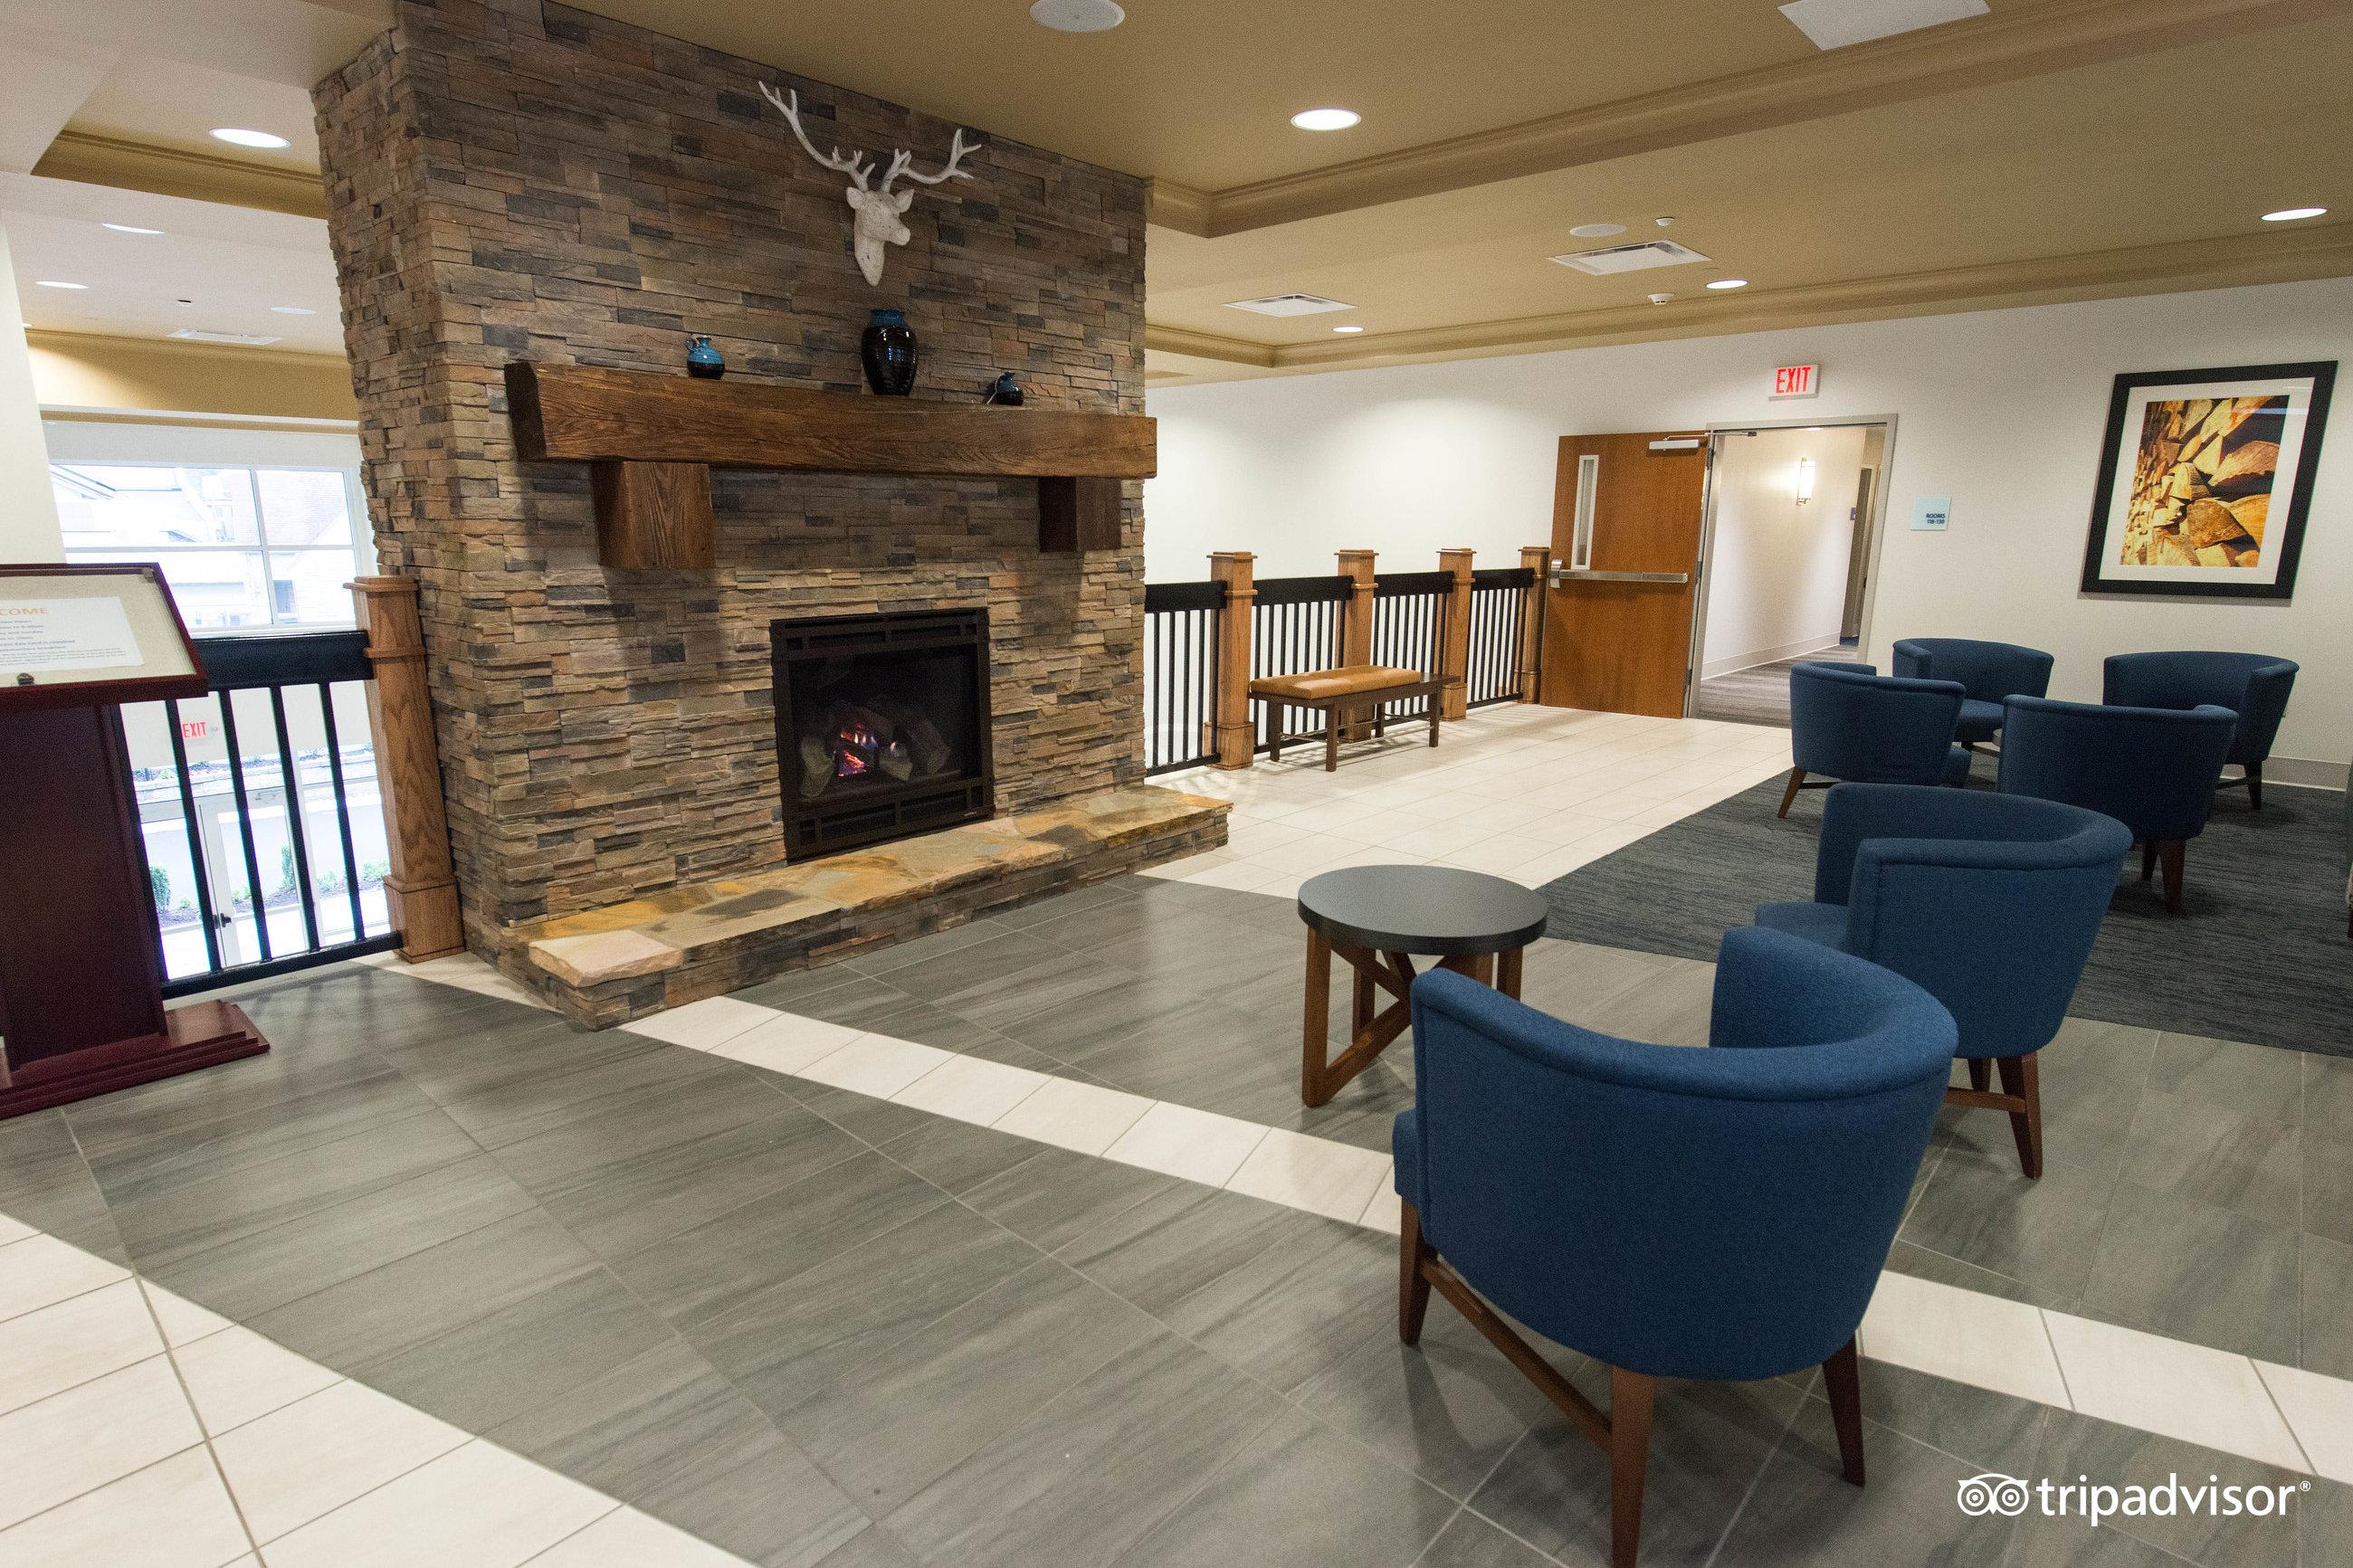 holiday inn express gatlinburg downtown tn 2018 hotel review